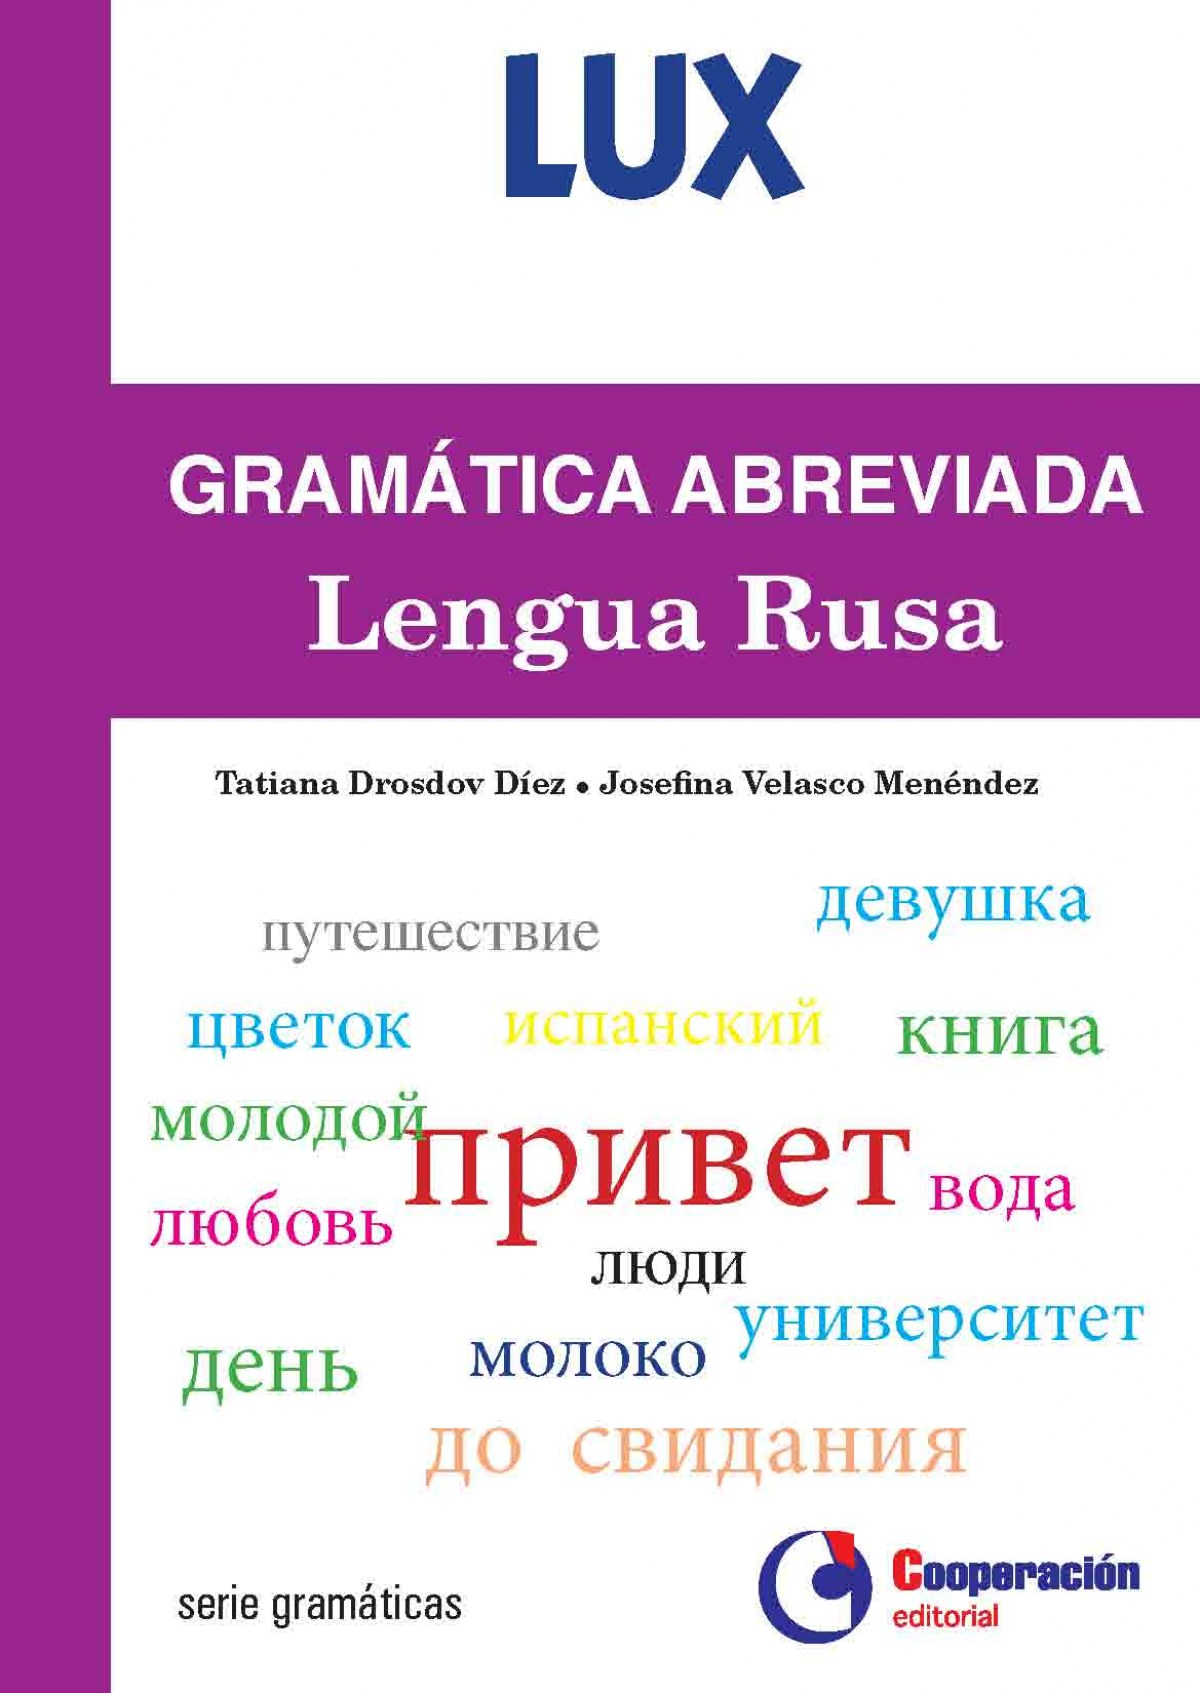 GRAMÁTICA ABREVIADA DE LA LENGUA RUSA 9788416925049